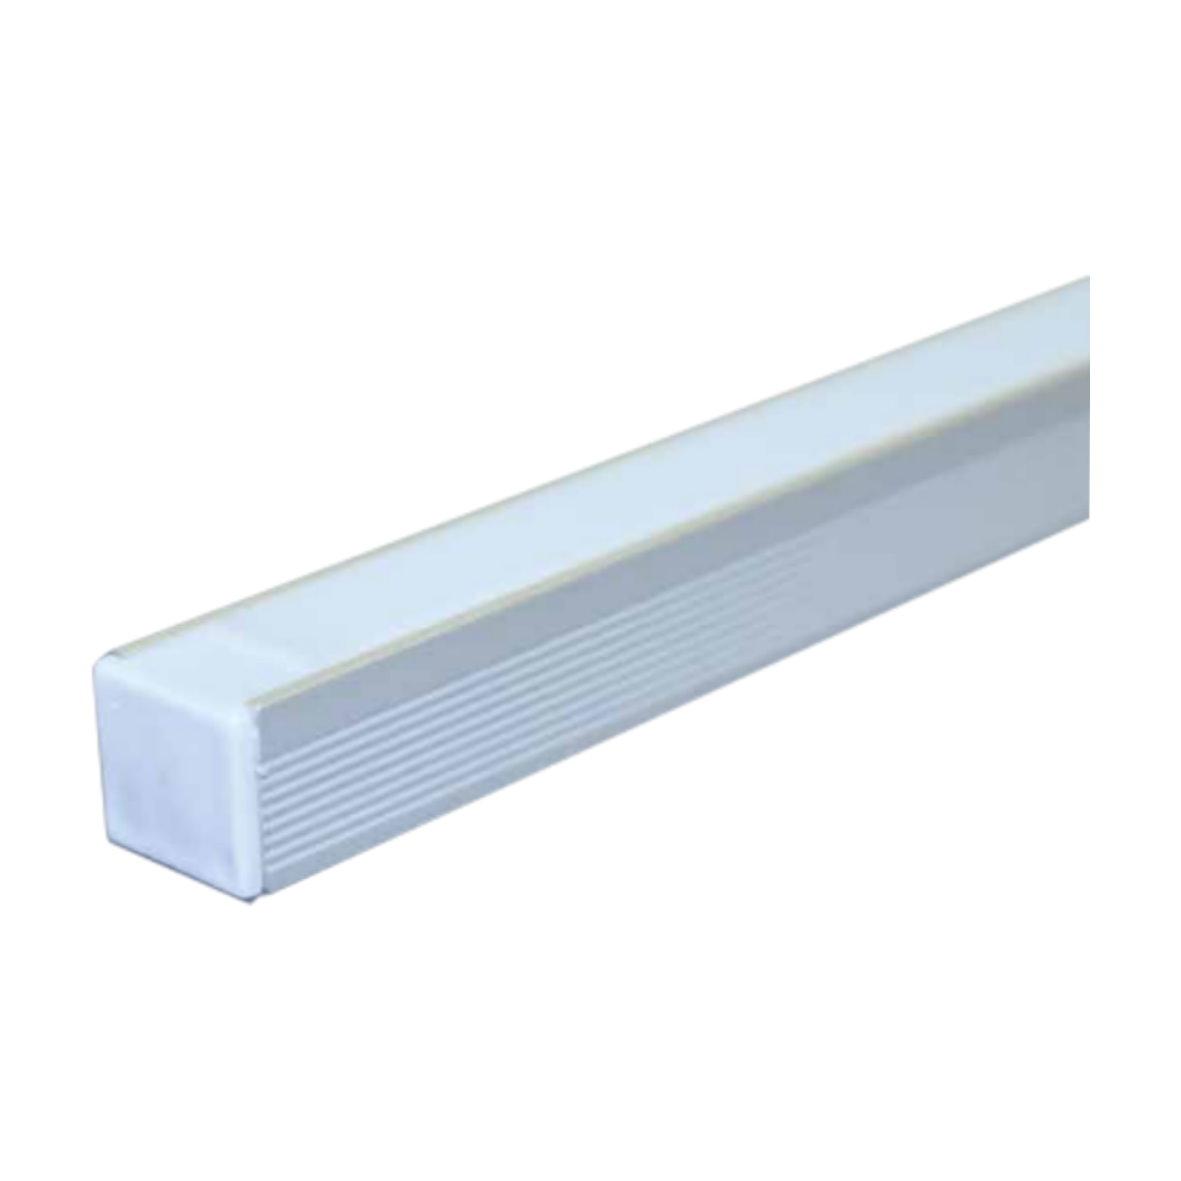 Aluprofil eloxiert f r led lichtband for Design artikel shop